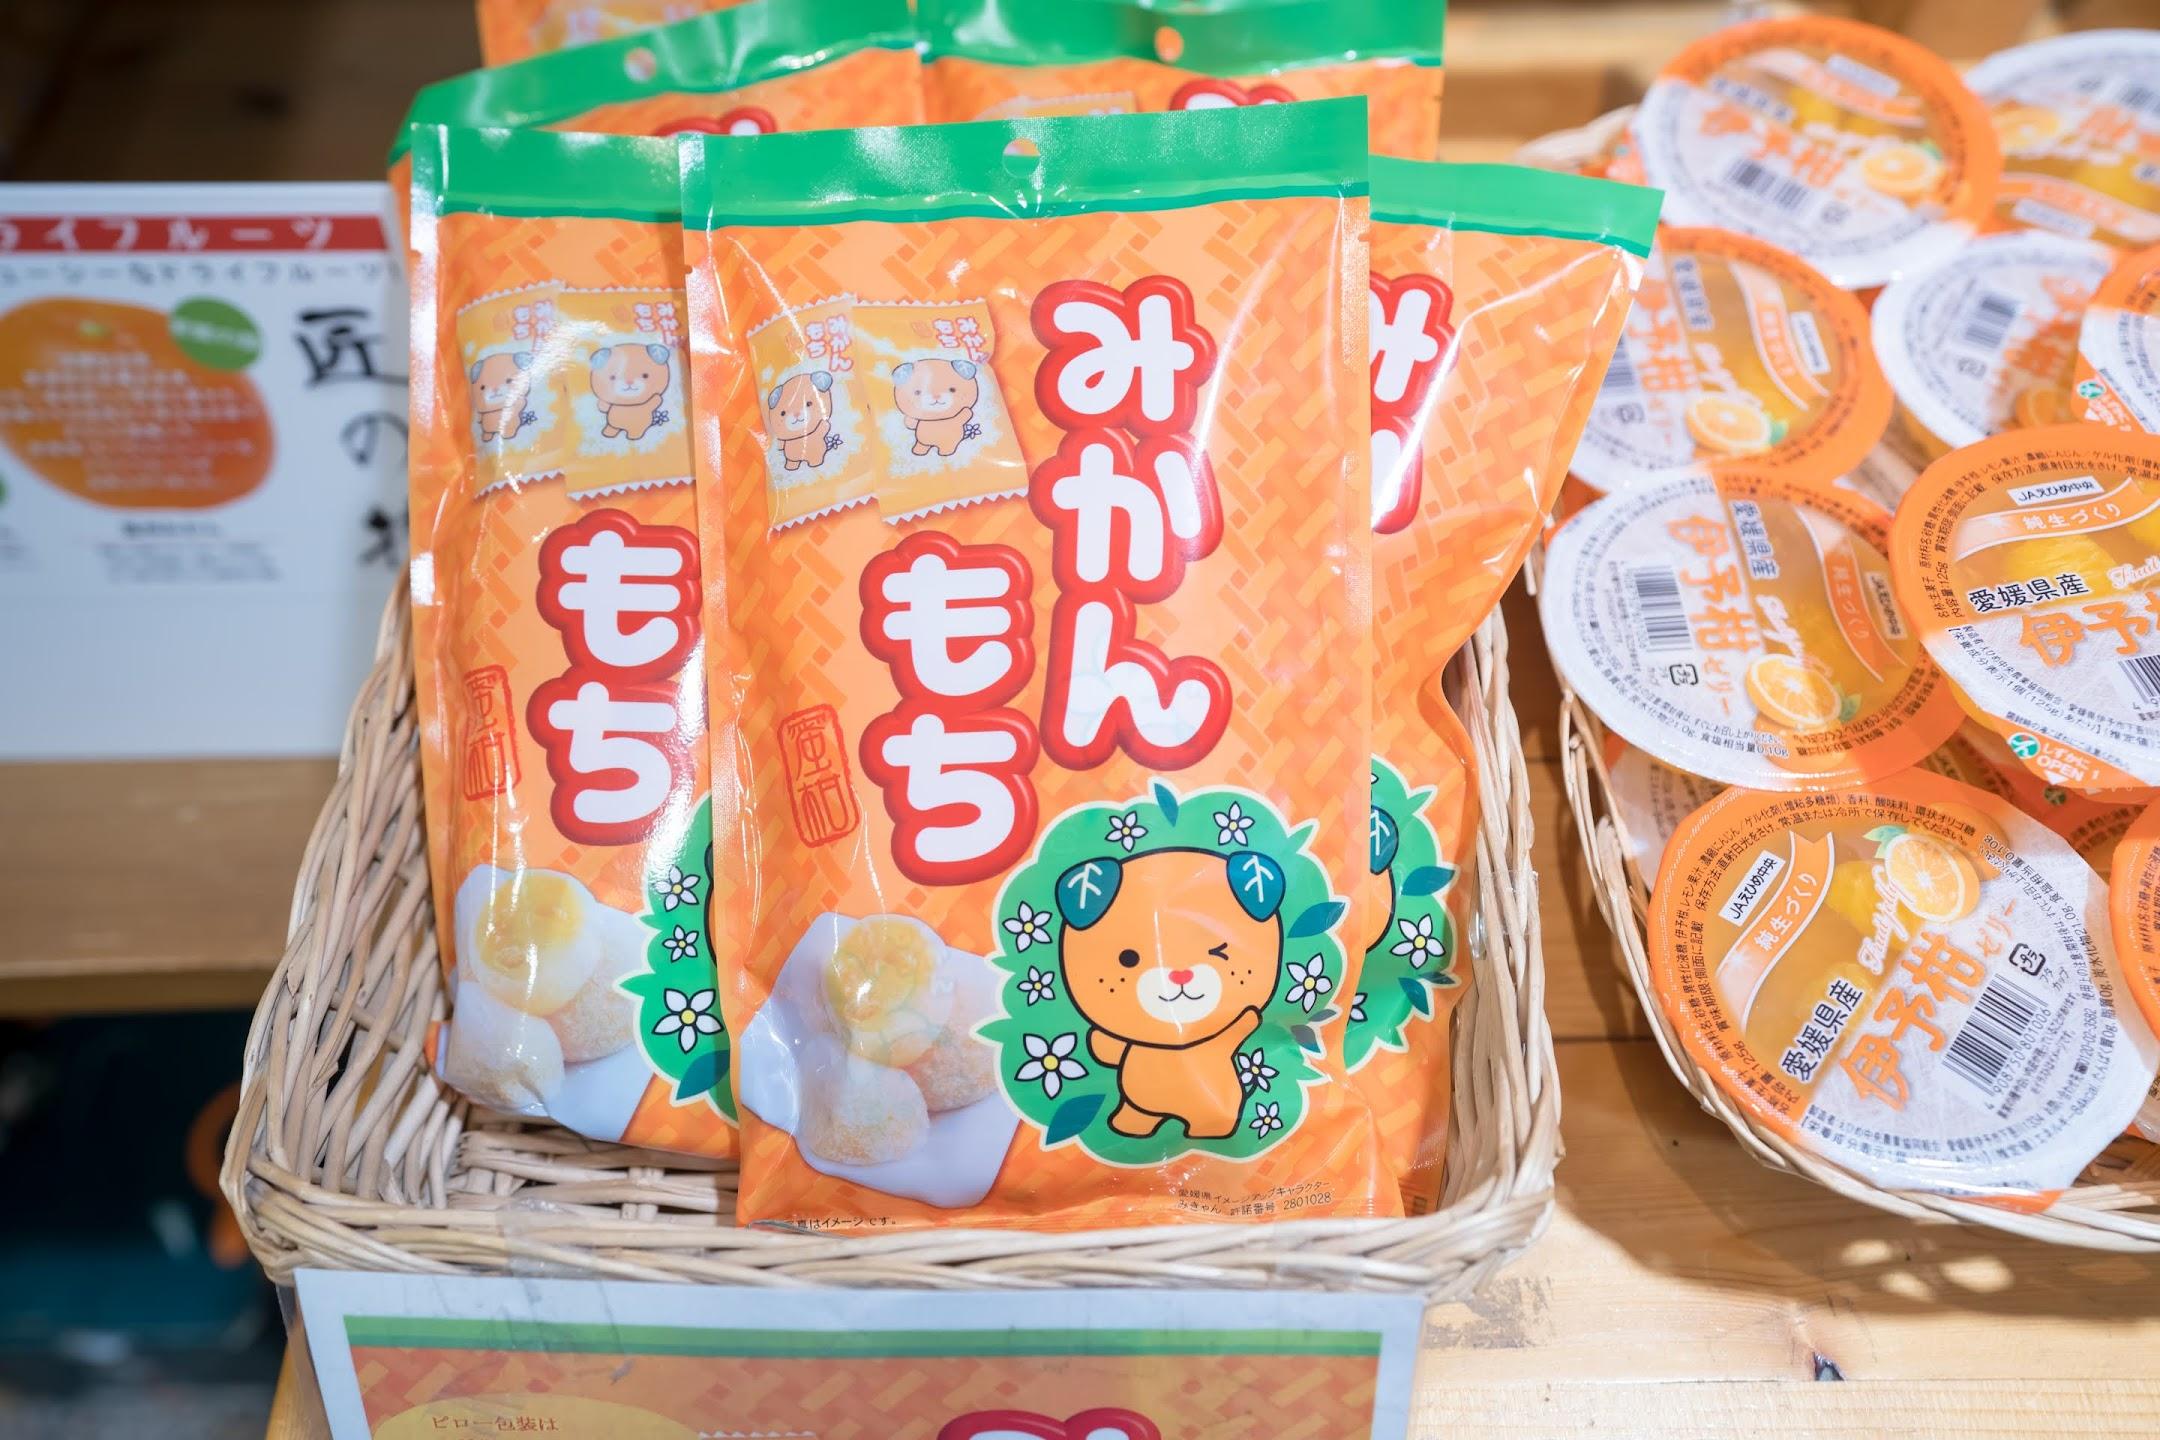 Mican rice cake